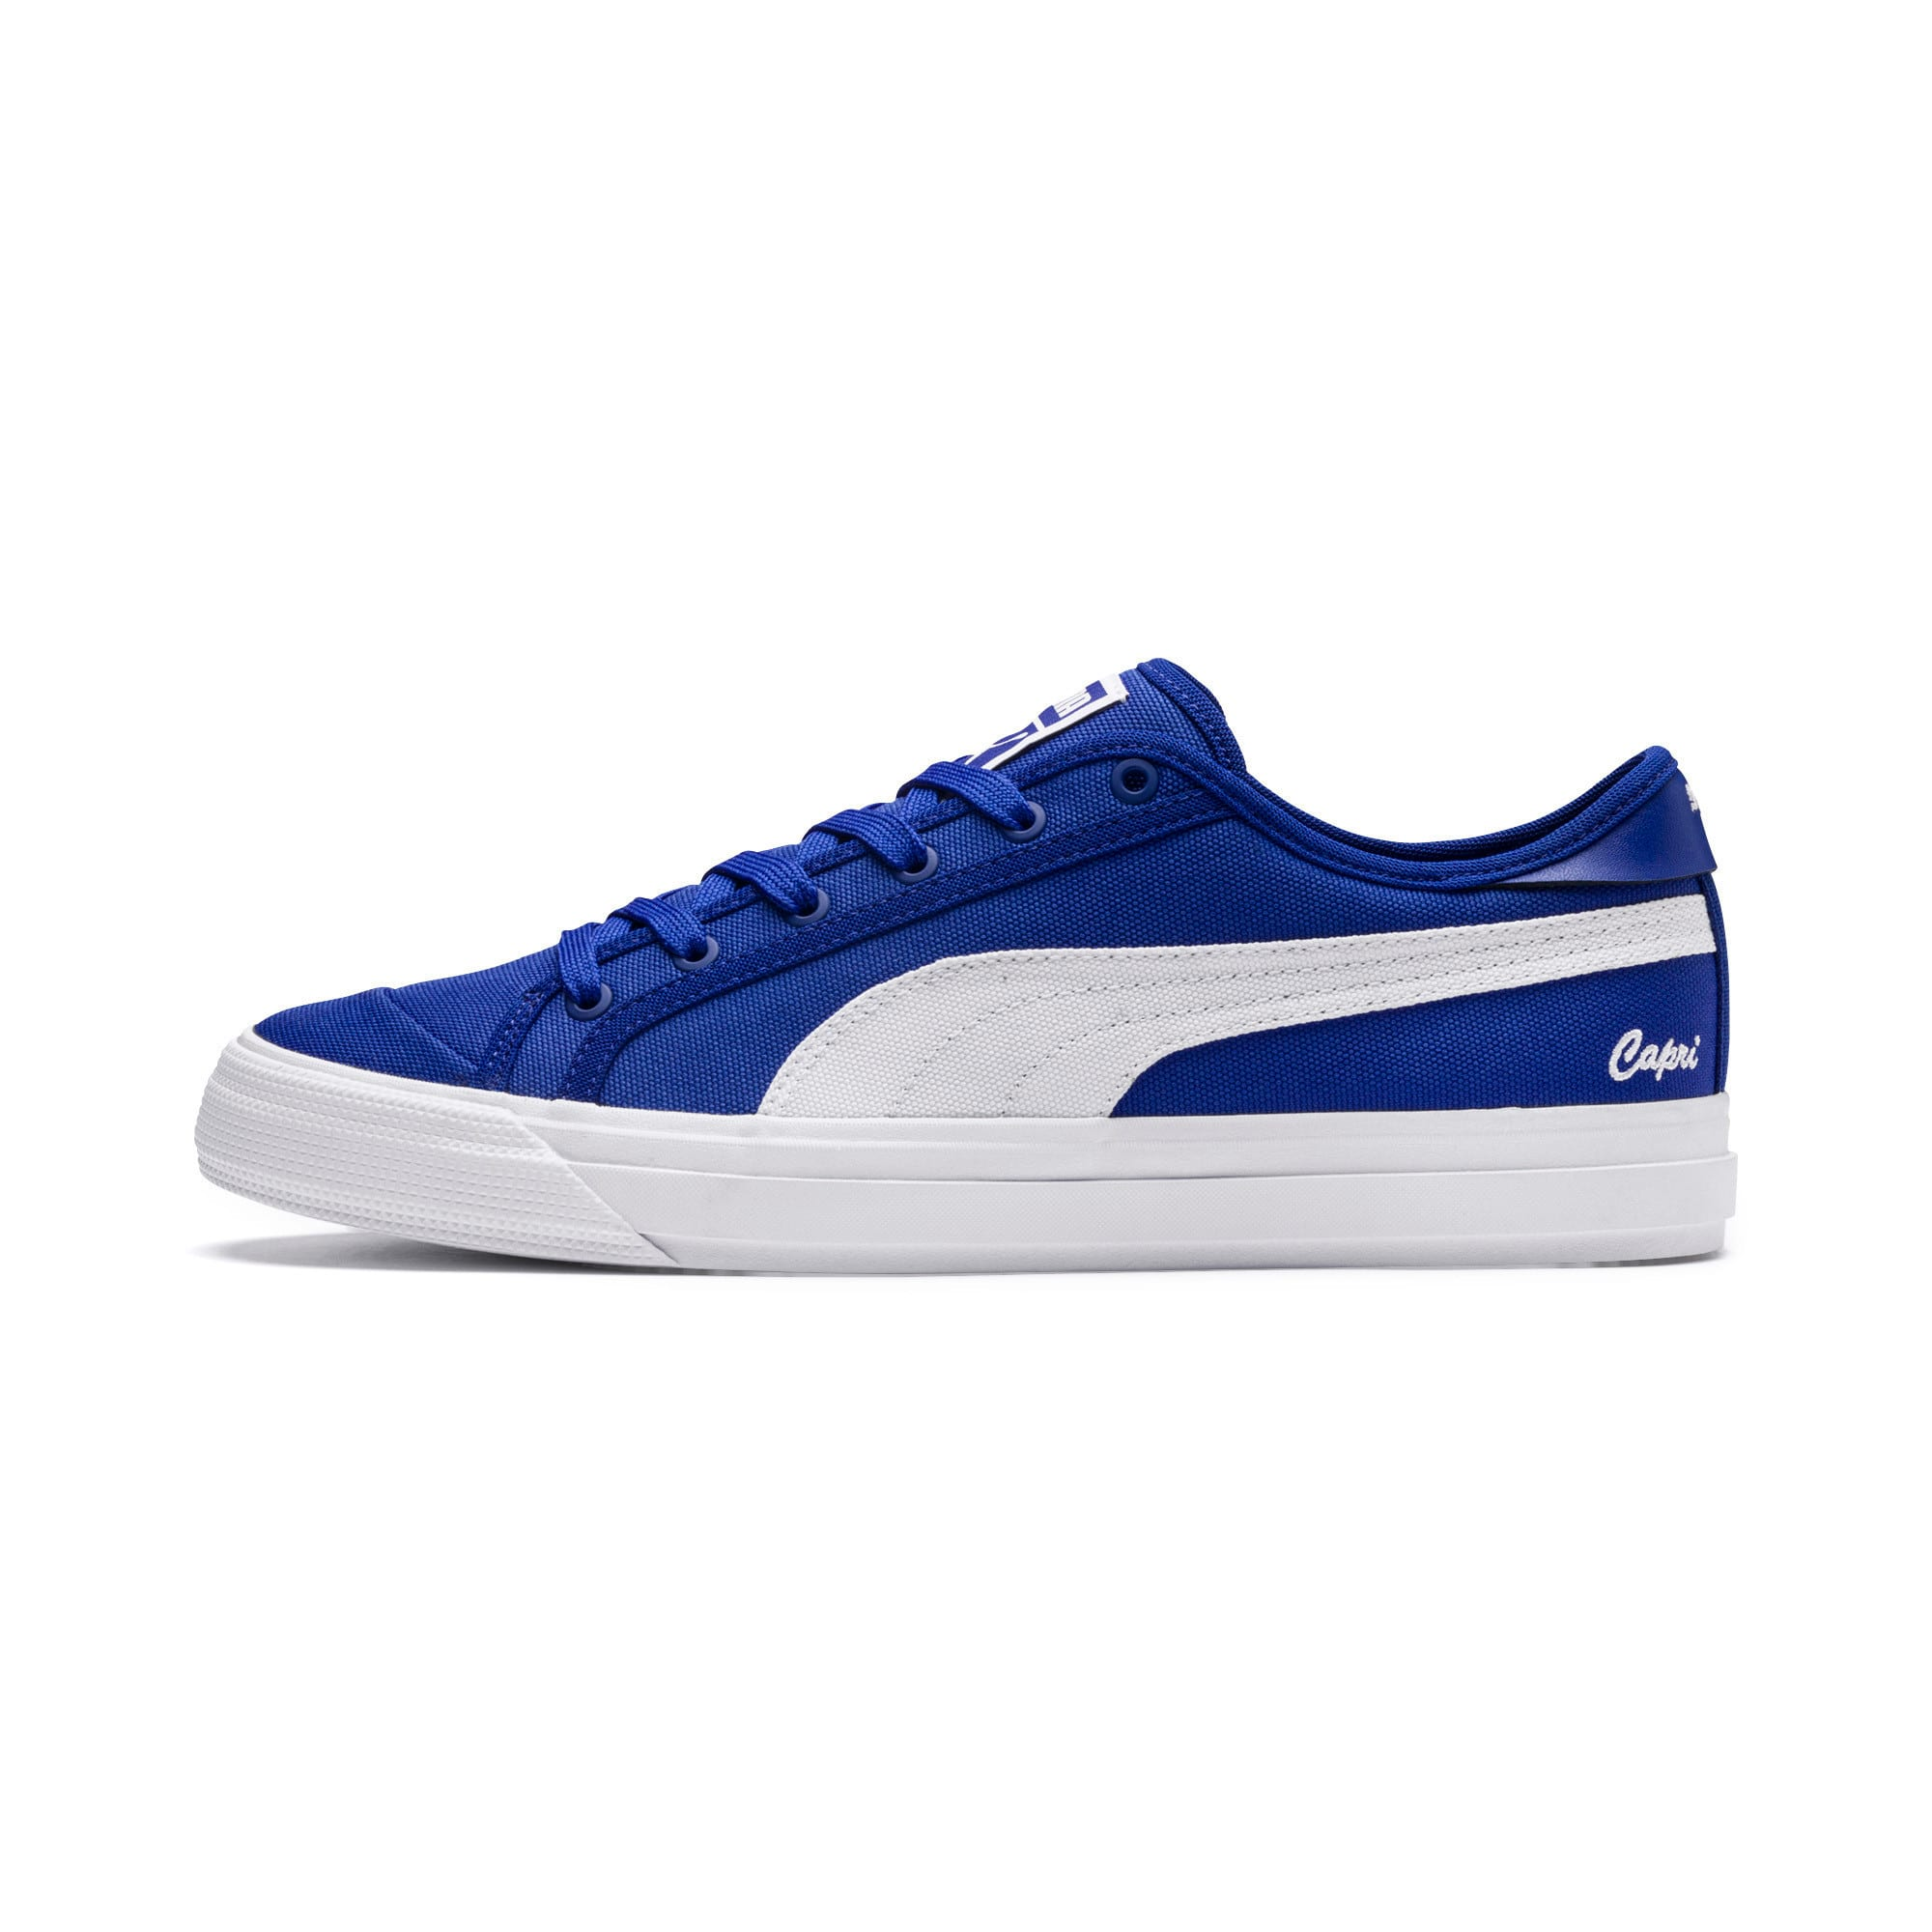 Thumbnail 1 of Capri Tennis Shoes, Surf DWeb-Puma Wht-Puma Wht, medium-IND